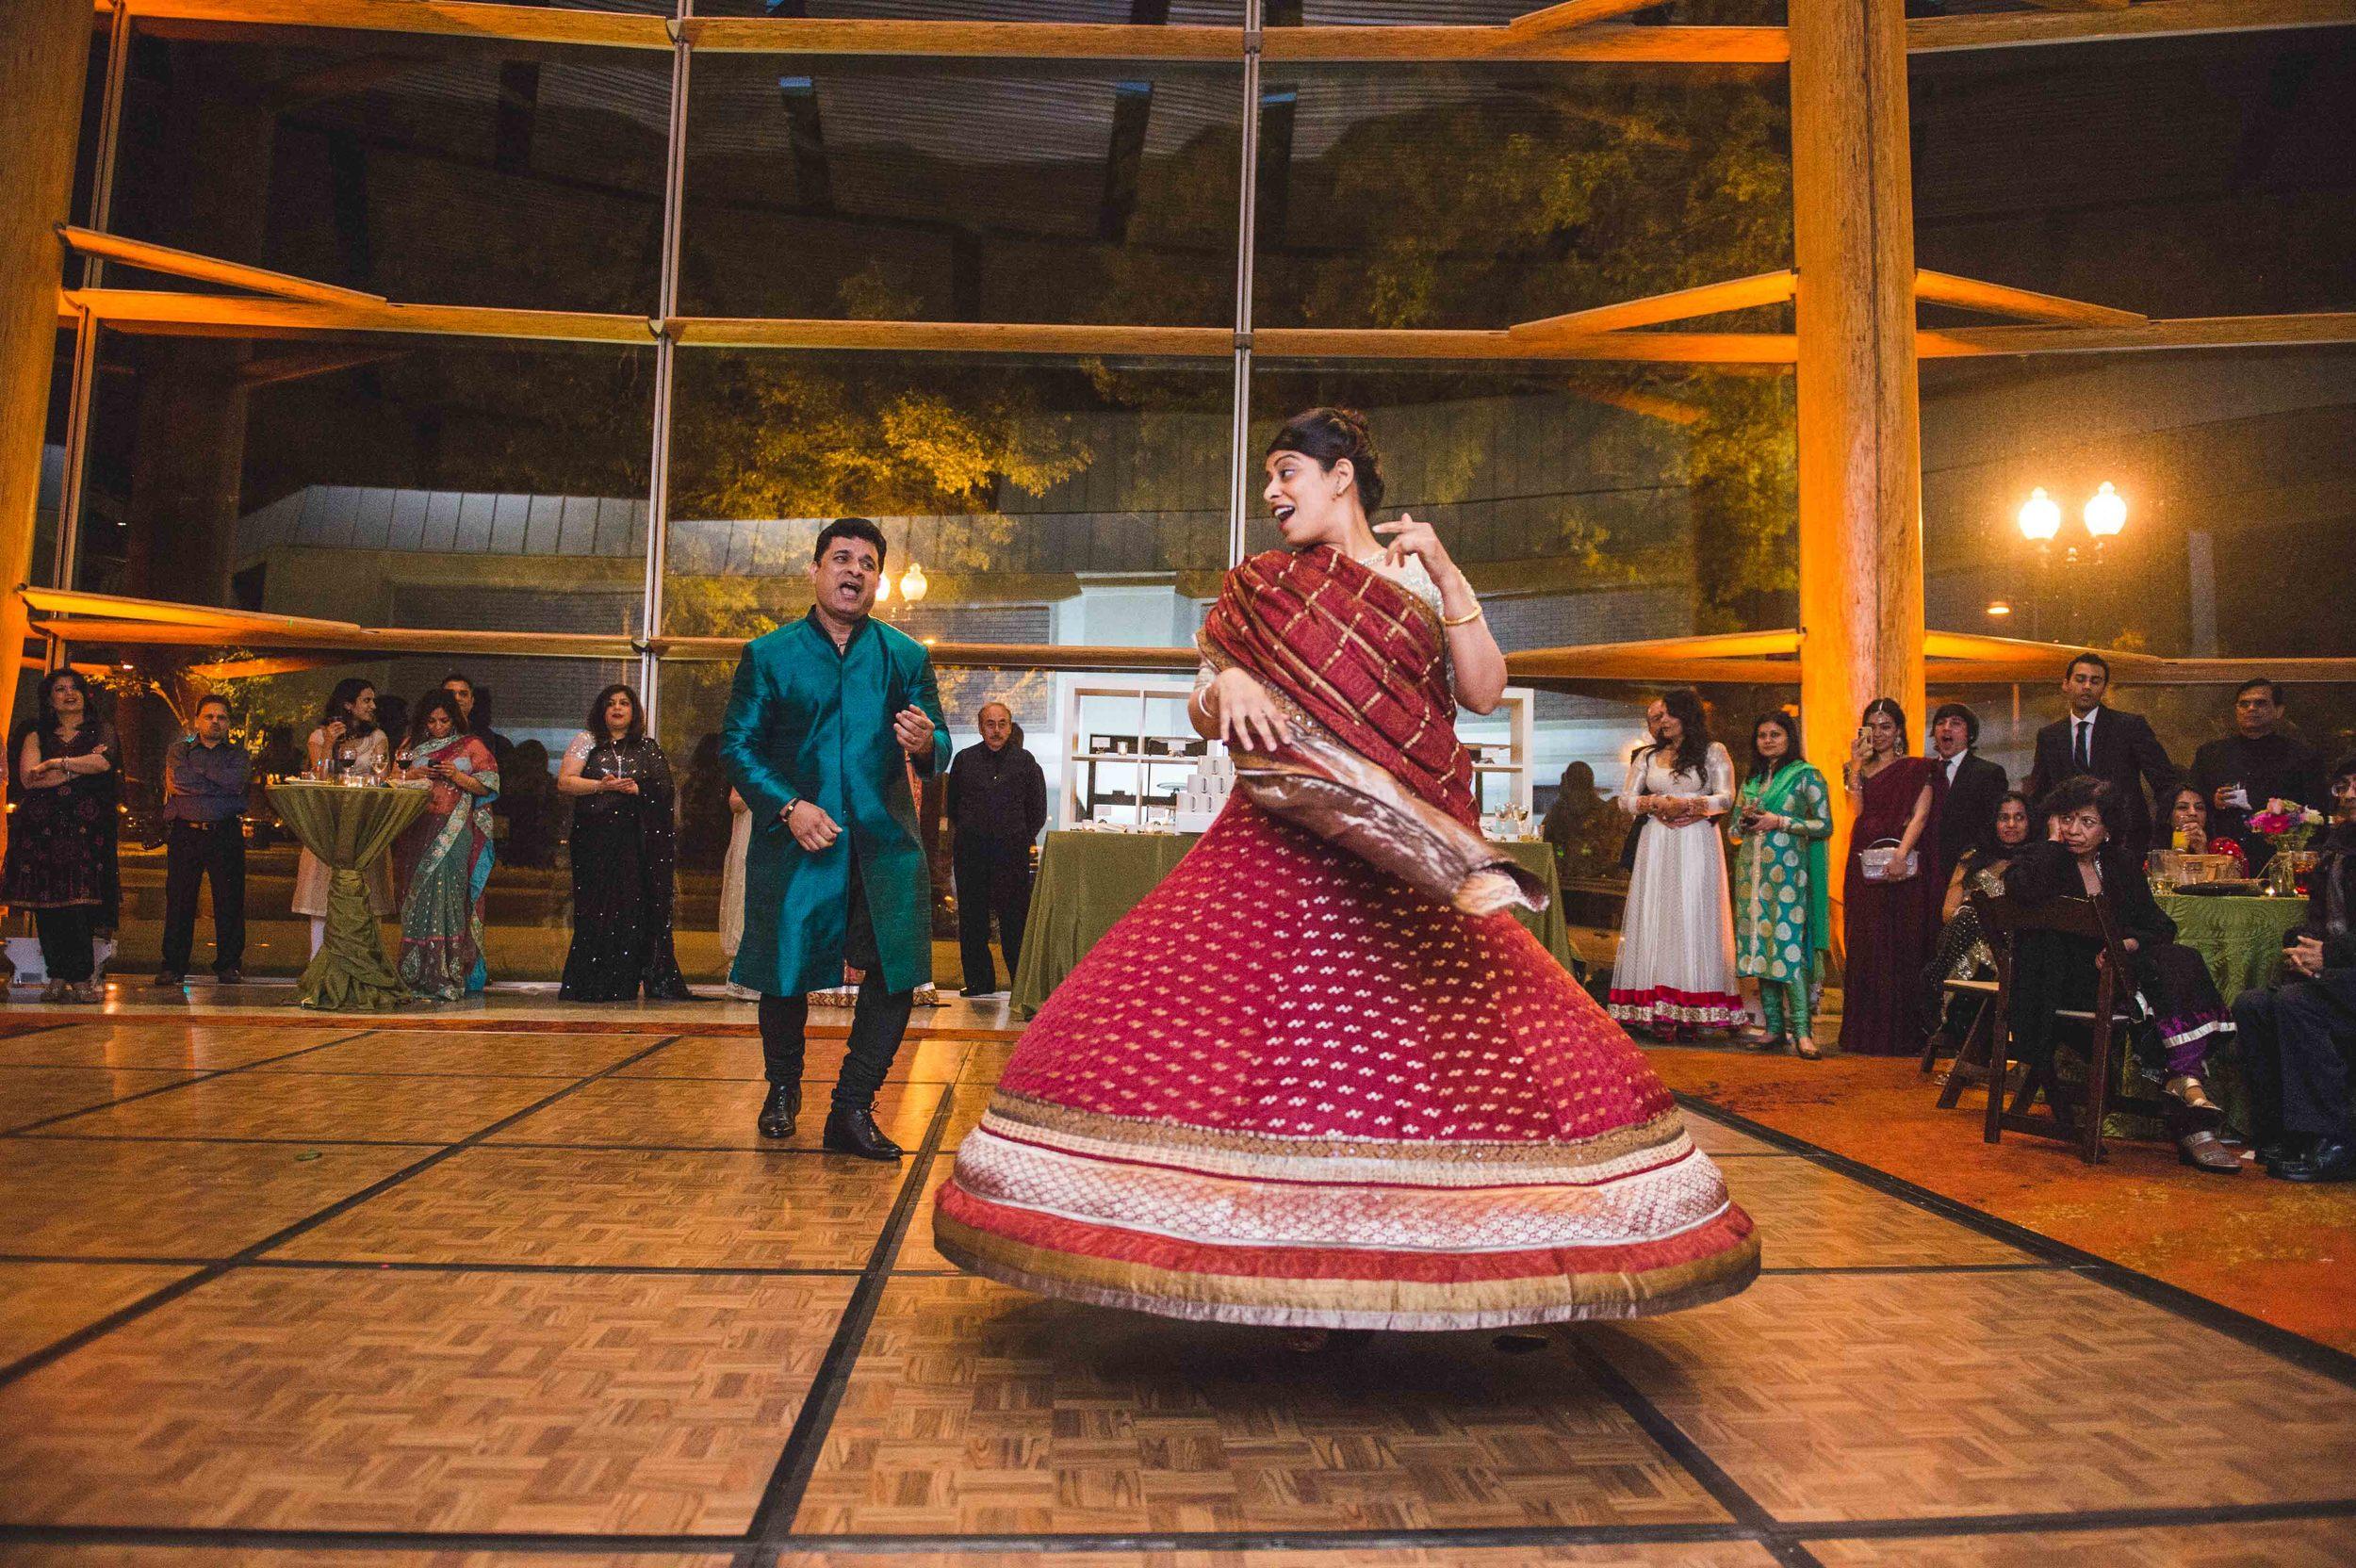 Indian Pre-wedding  at Arena Stage Washington DC by Mantas Kubilinskas-28.jpg